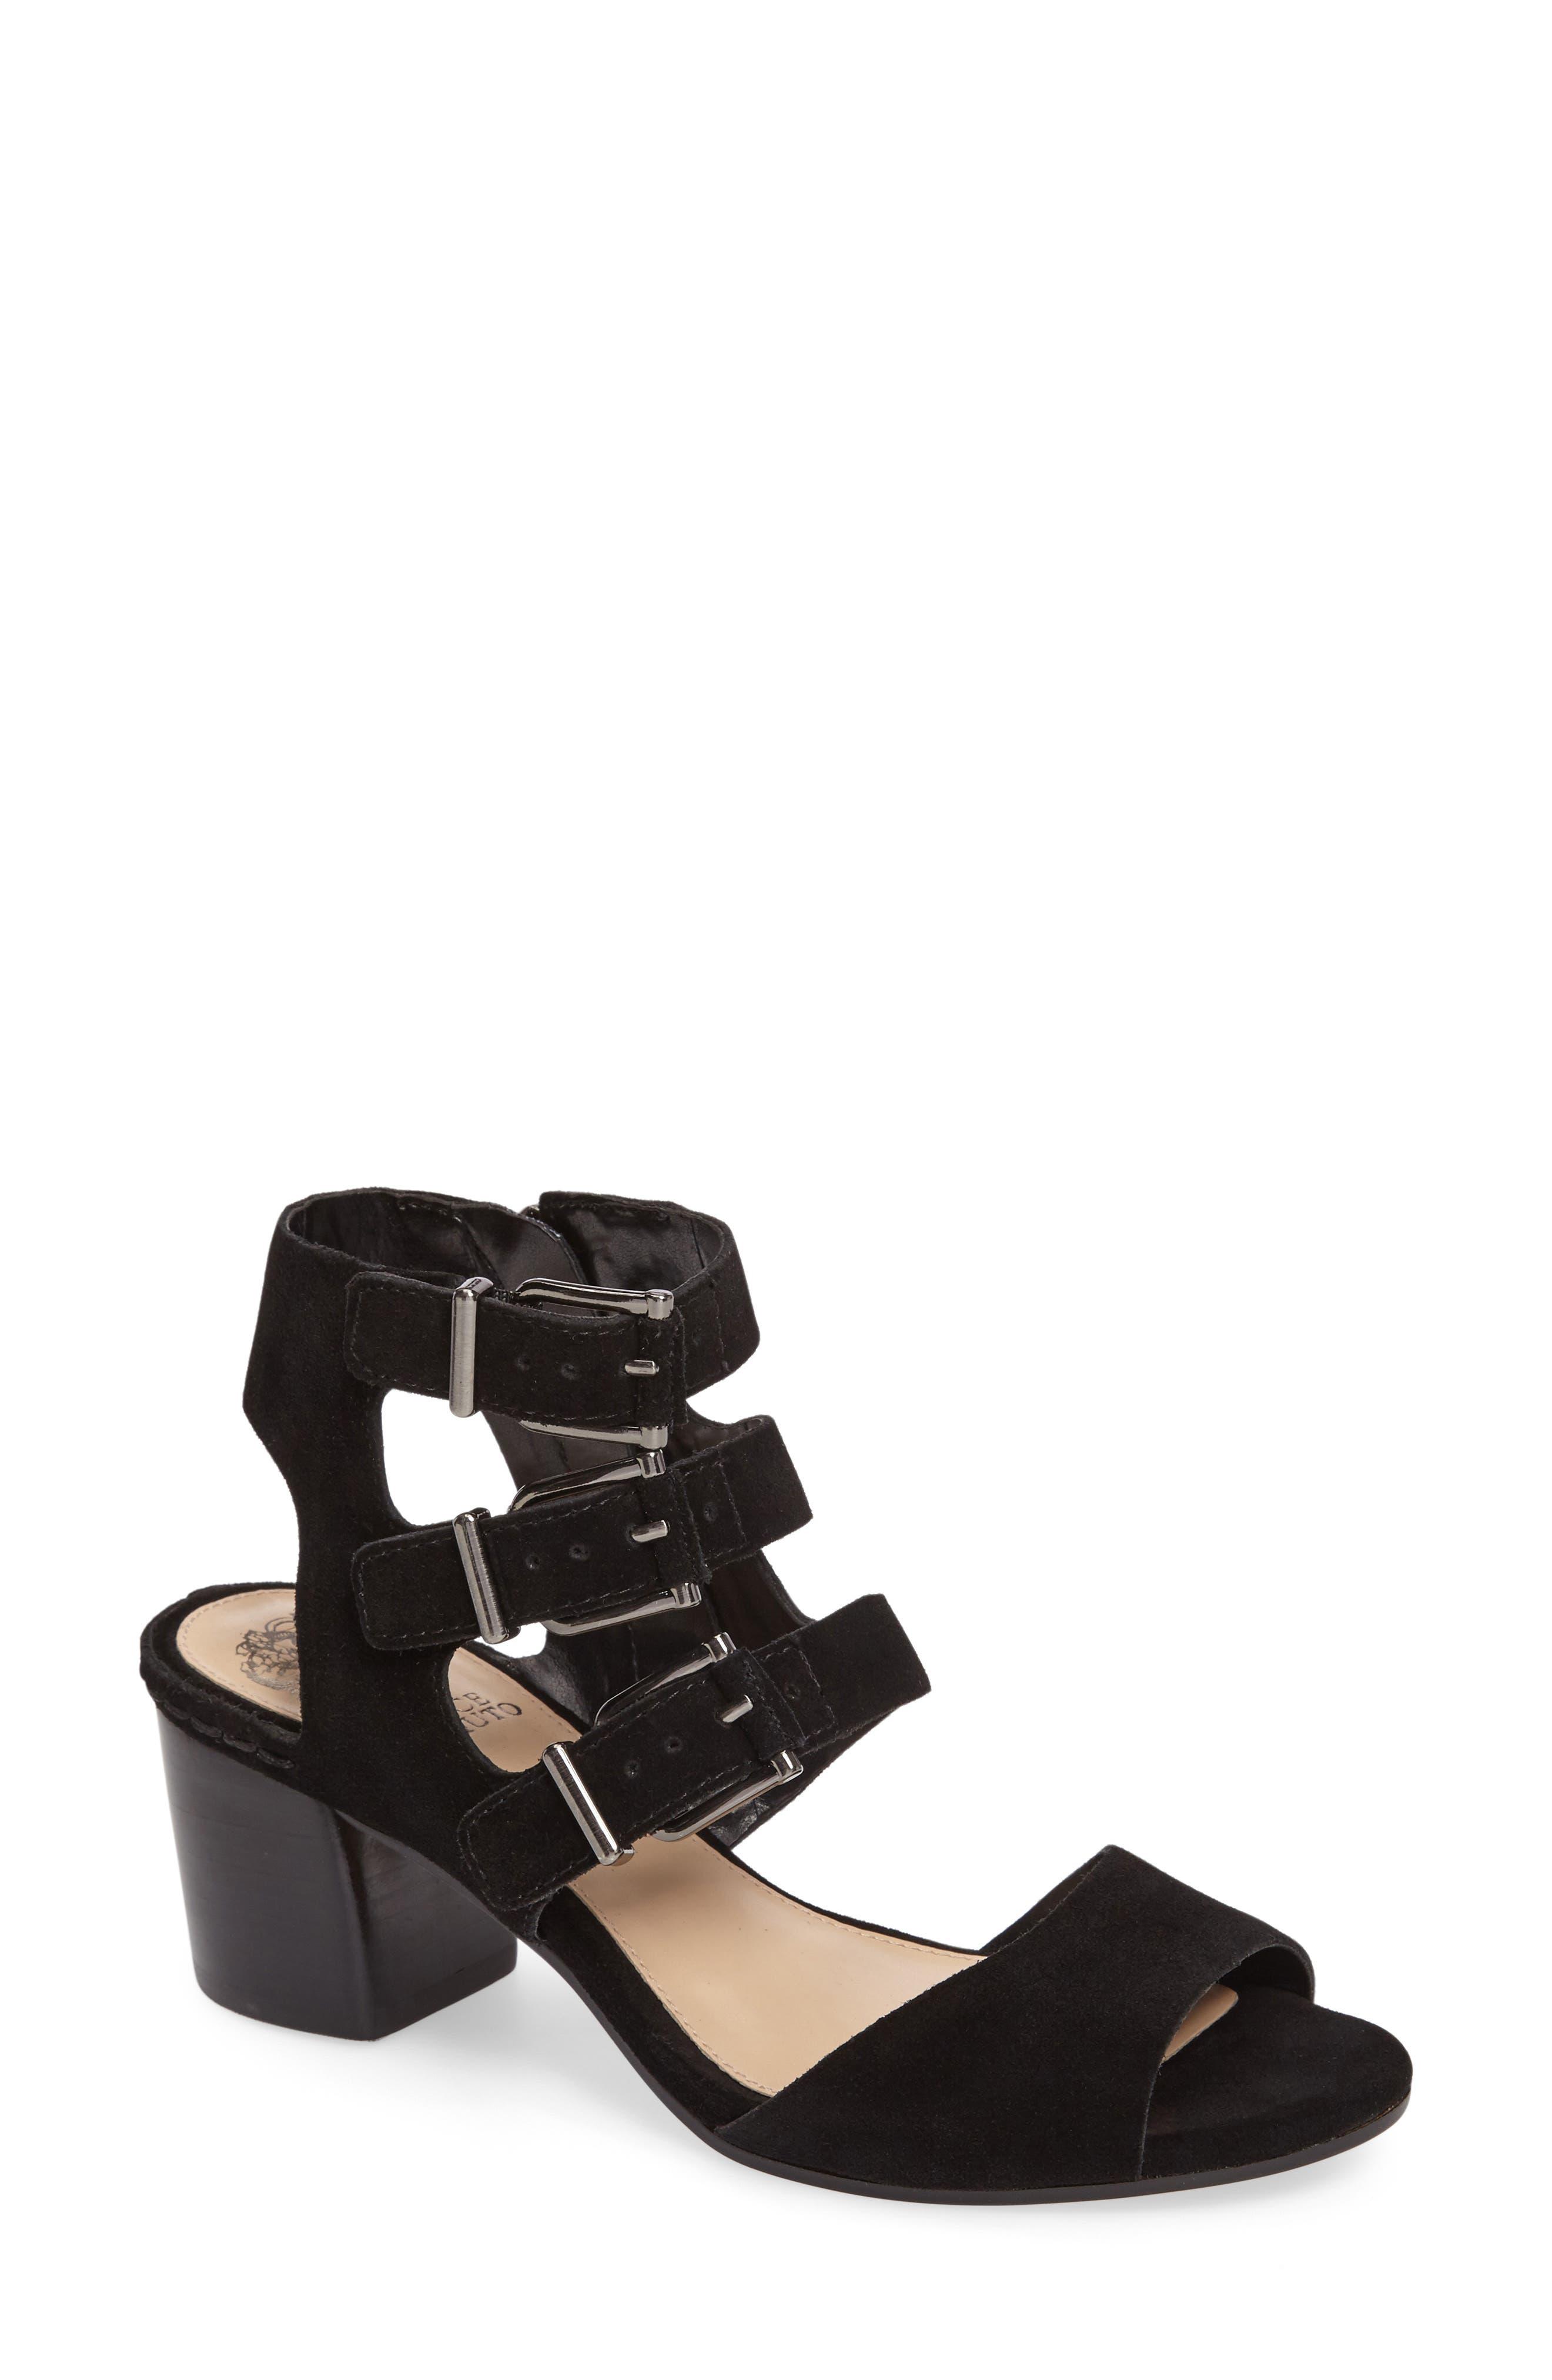 Geriann Strappy Slingback Sandal,                         Main,                         color, 001